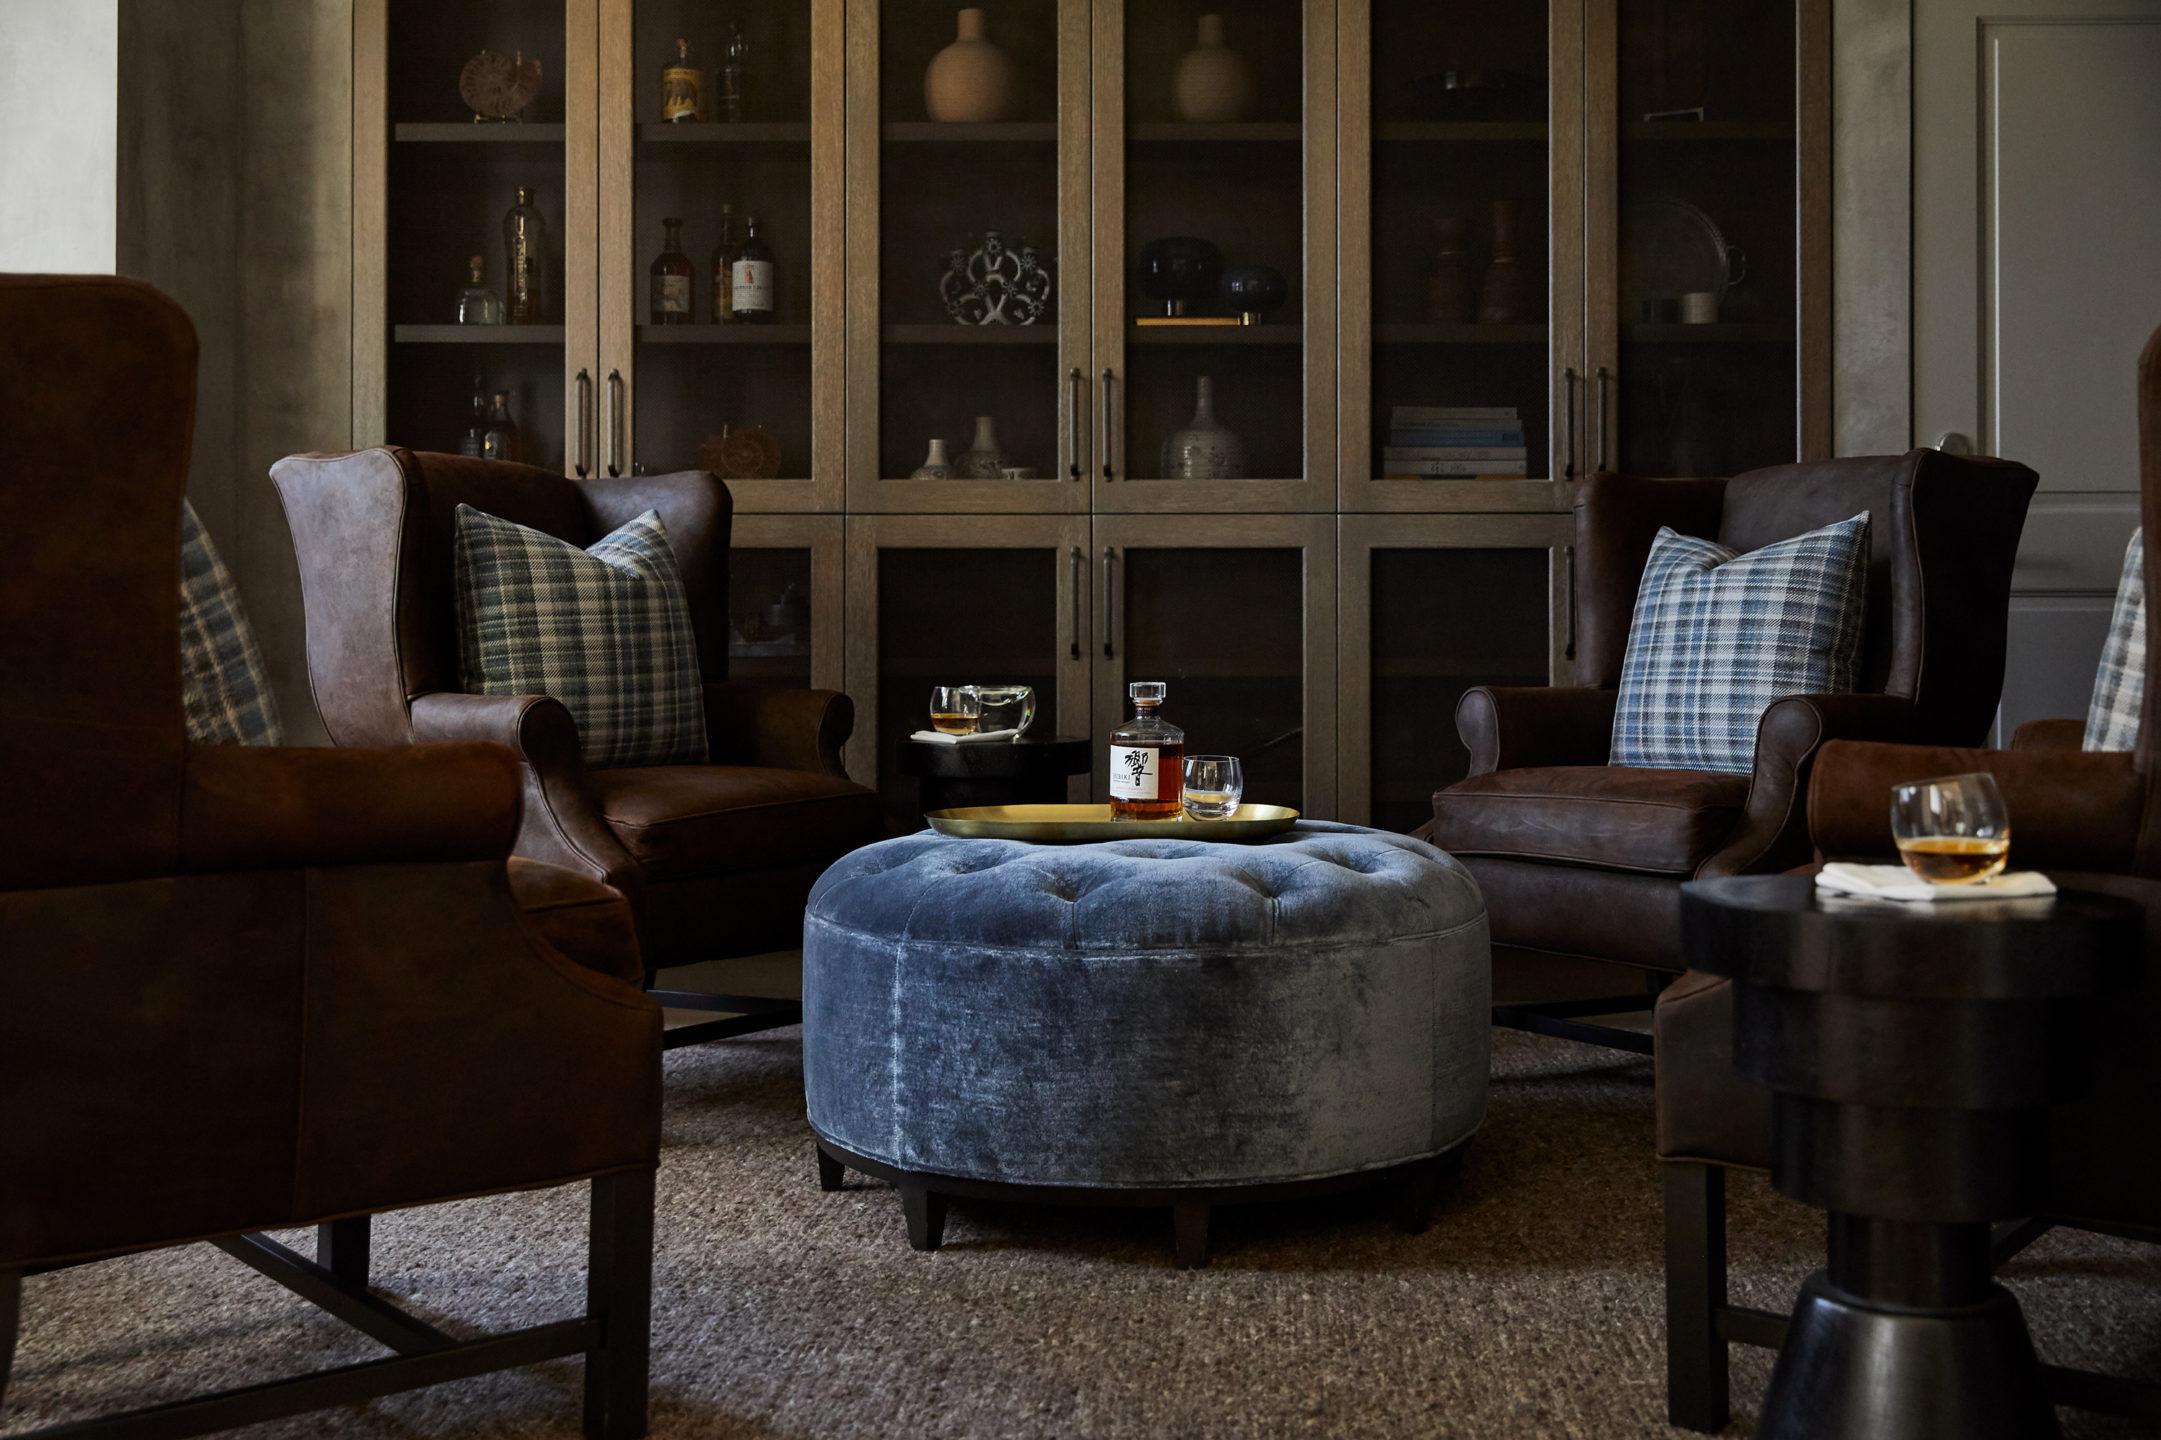 Jennifer_robins_interiors_projects_healdsburg_10_office_seating